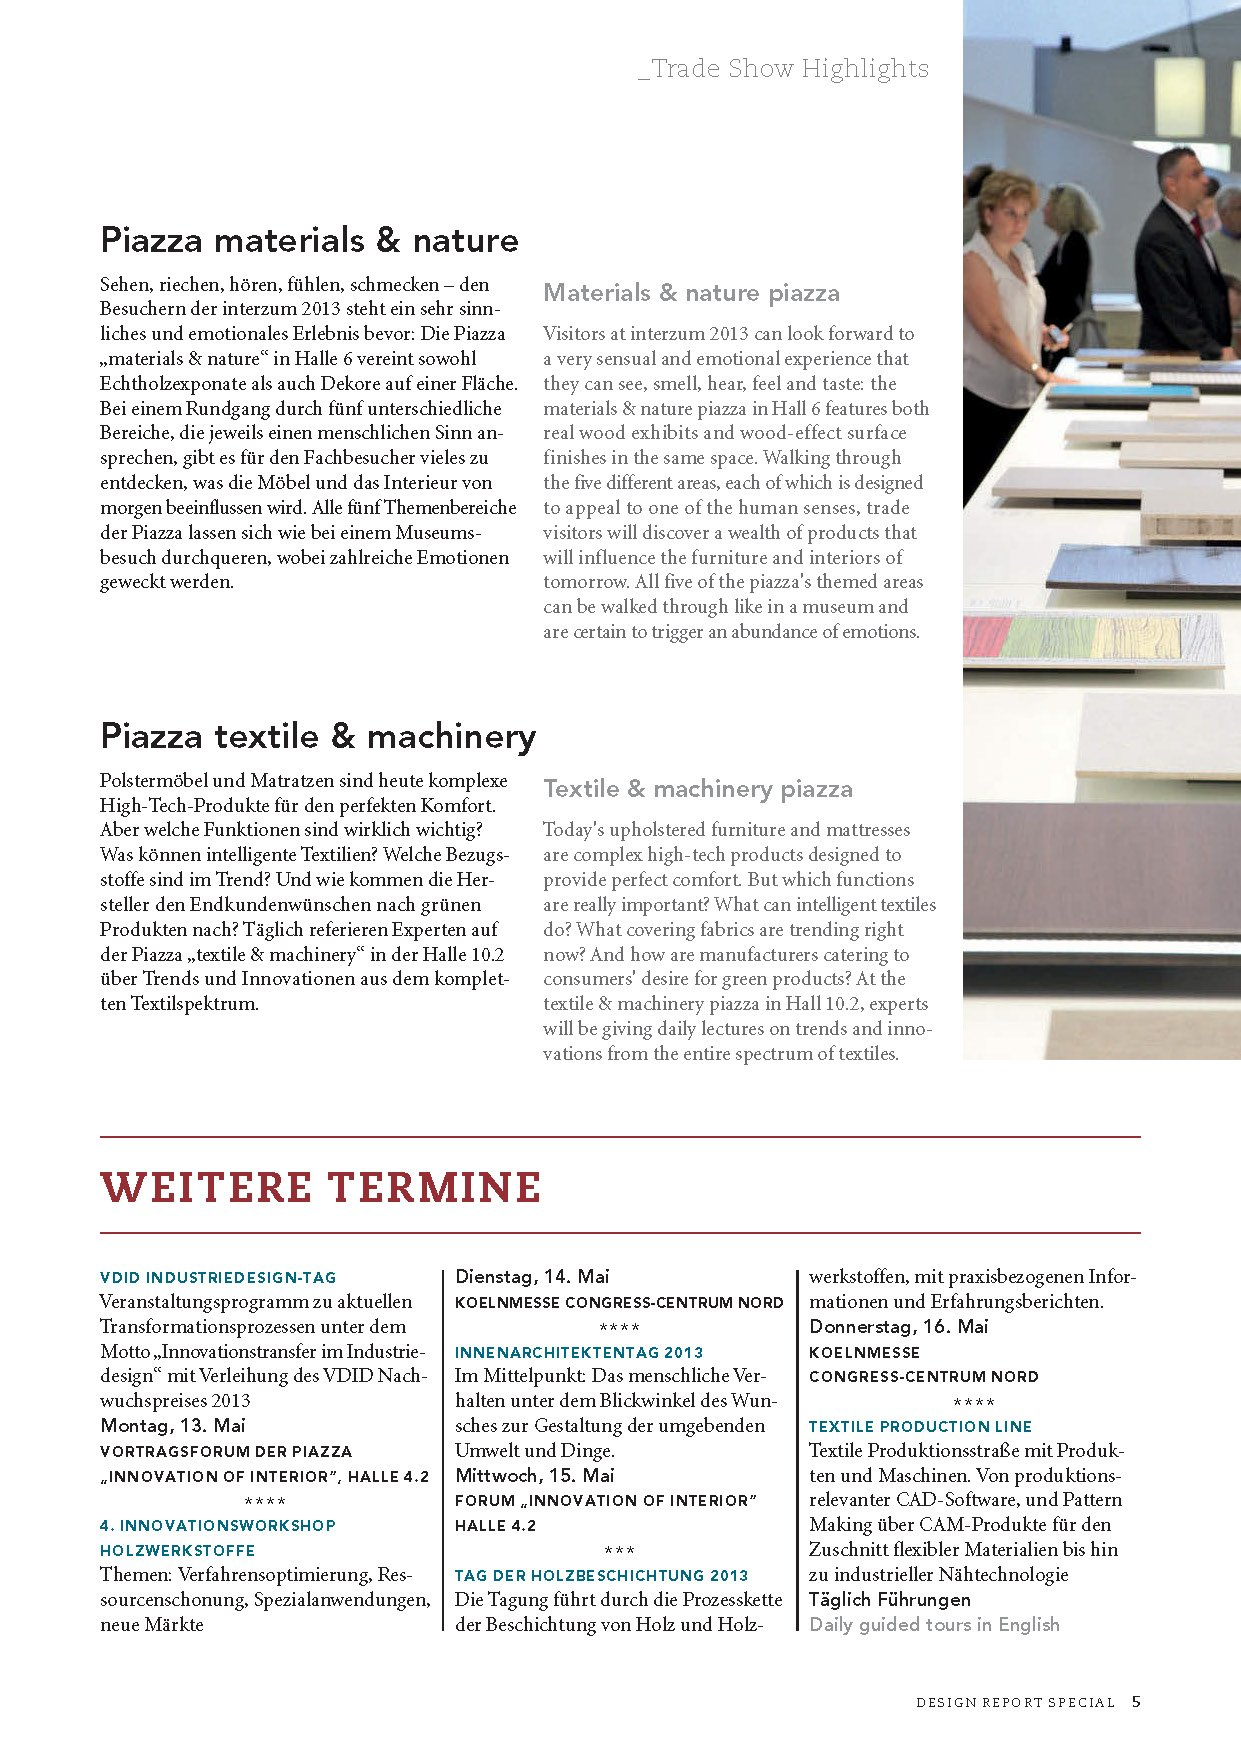 https://farconsulting.de/wp-content/uploads/2013/05/designreport_interzum2013_Seite_05.jpg